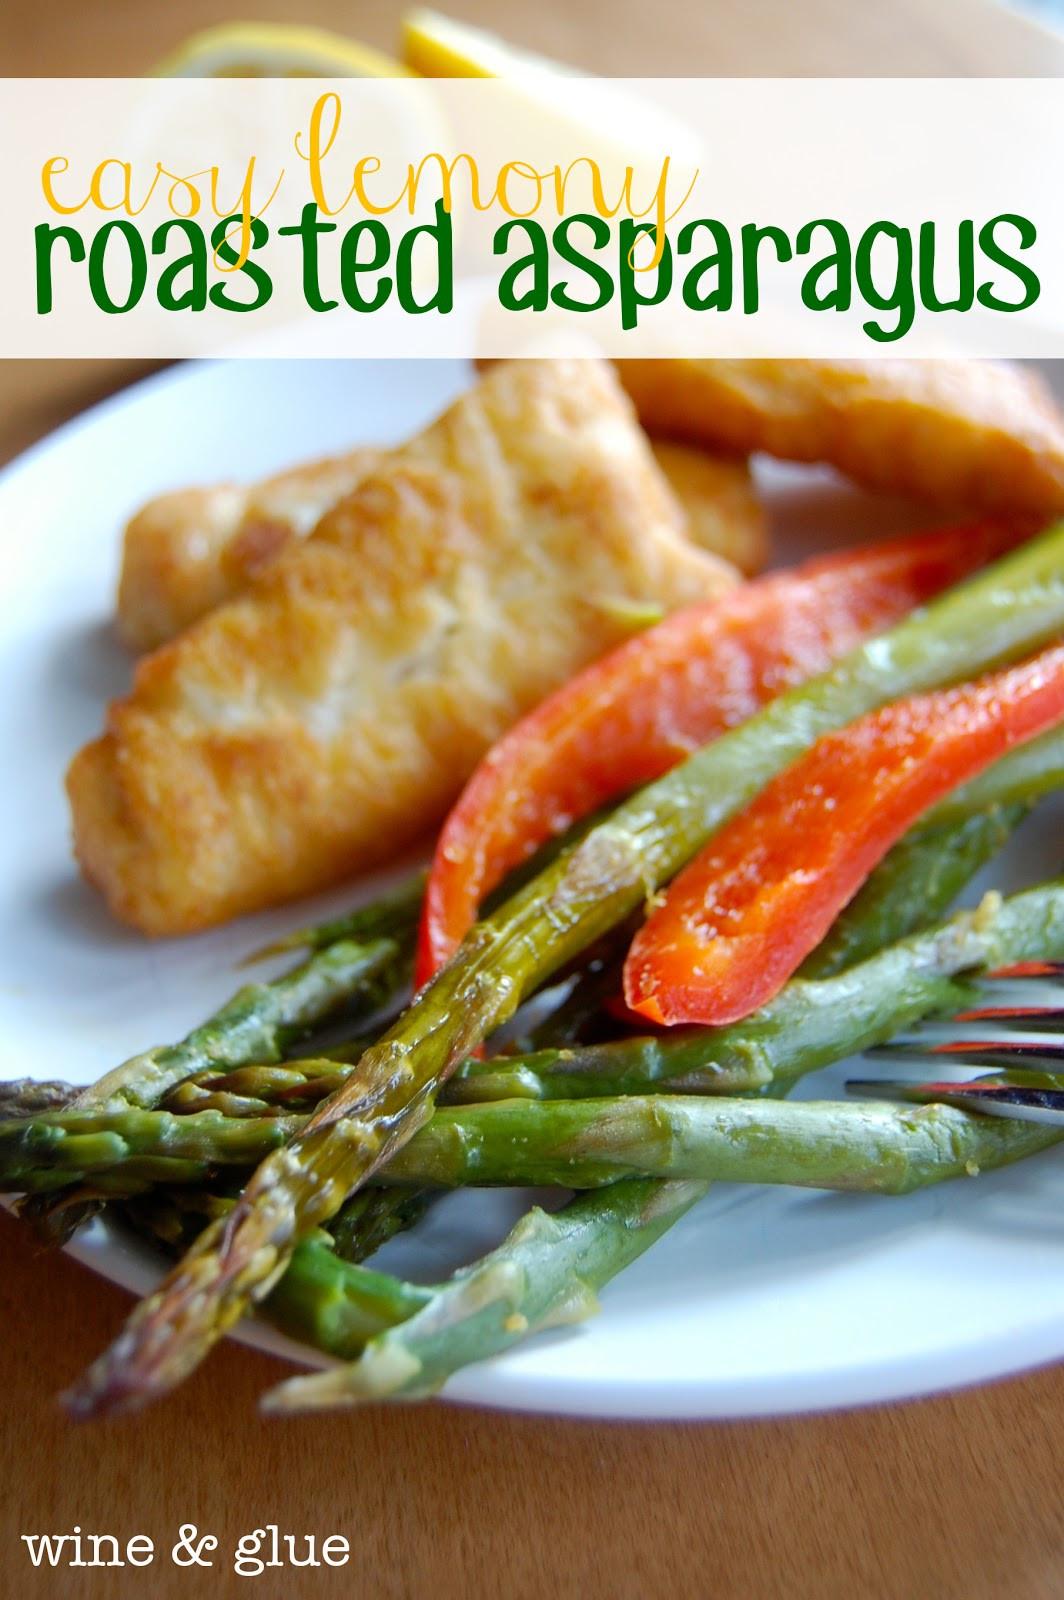 Asparagus Side Dishes  Easy Lemony Roasted Asparagus Wine & Glue